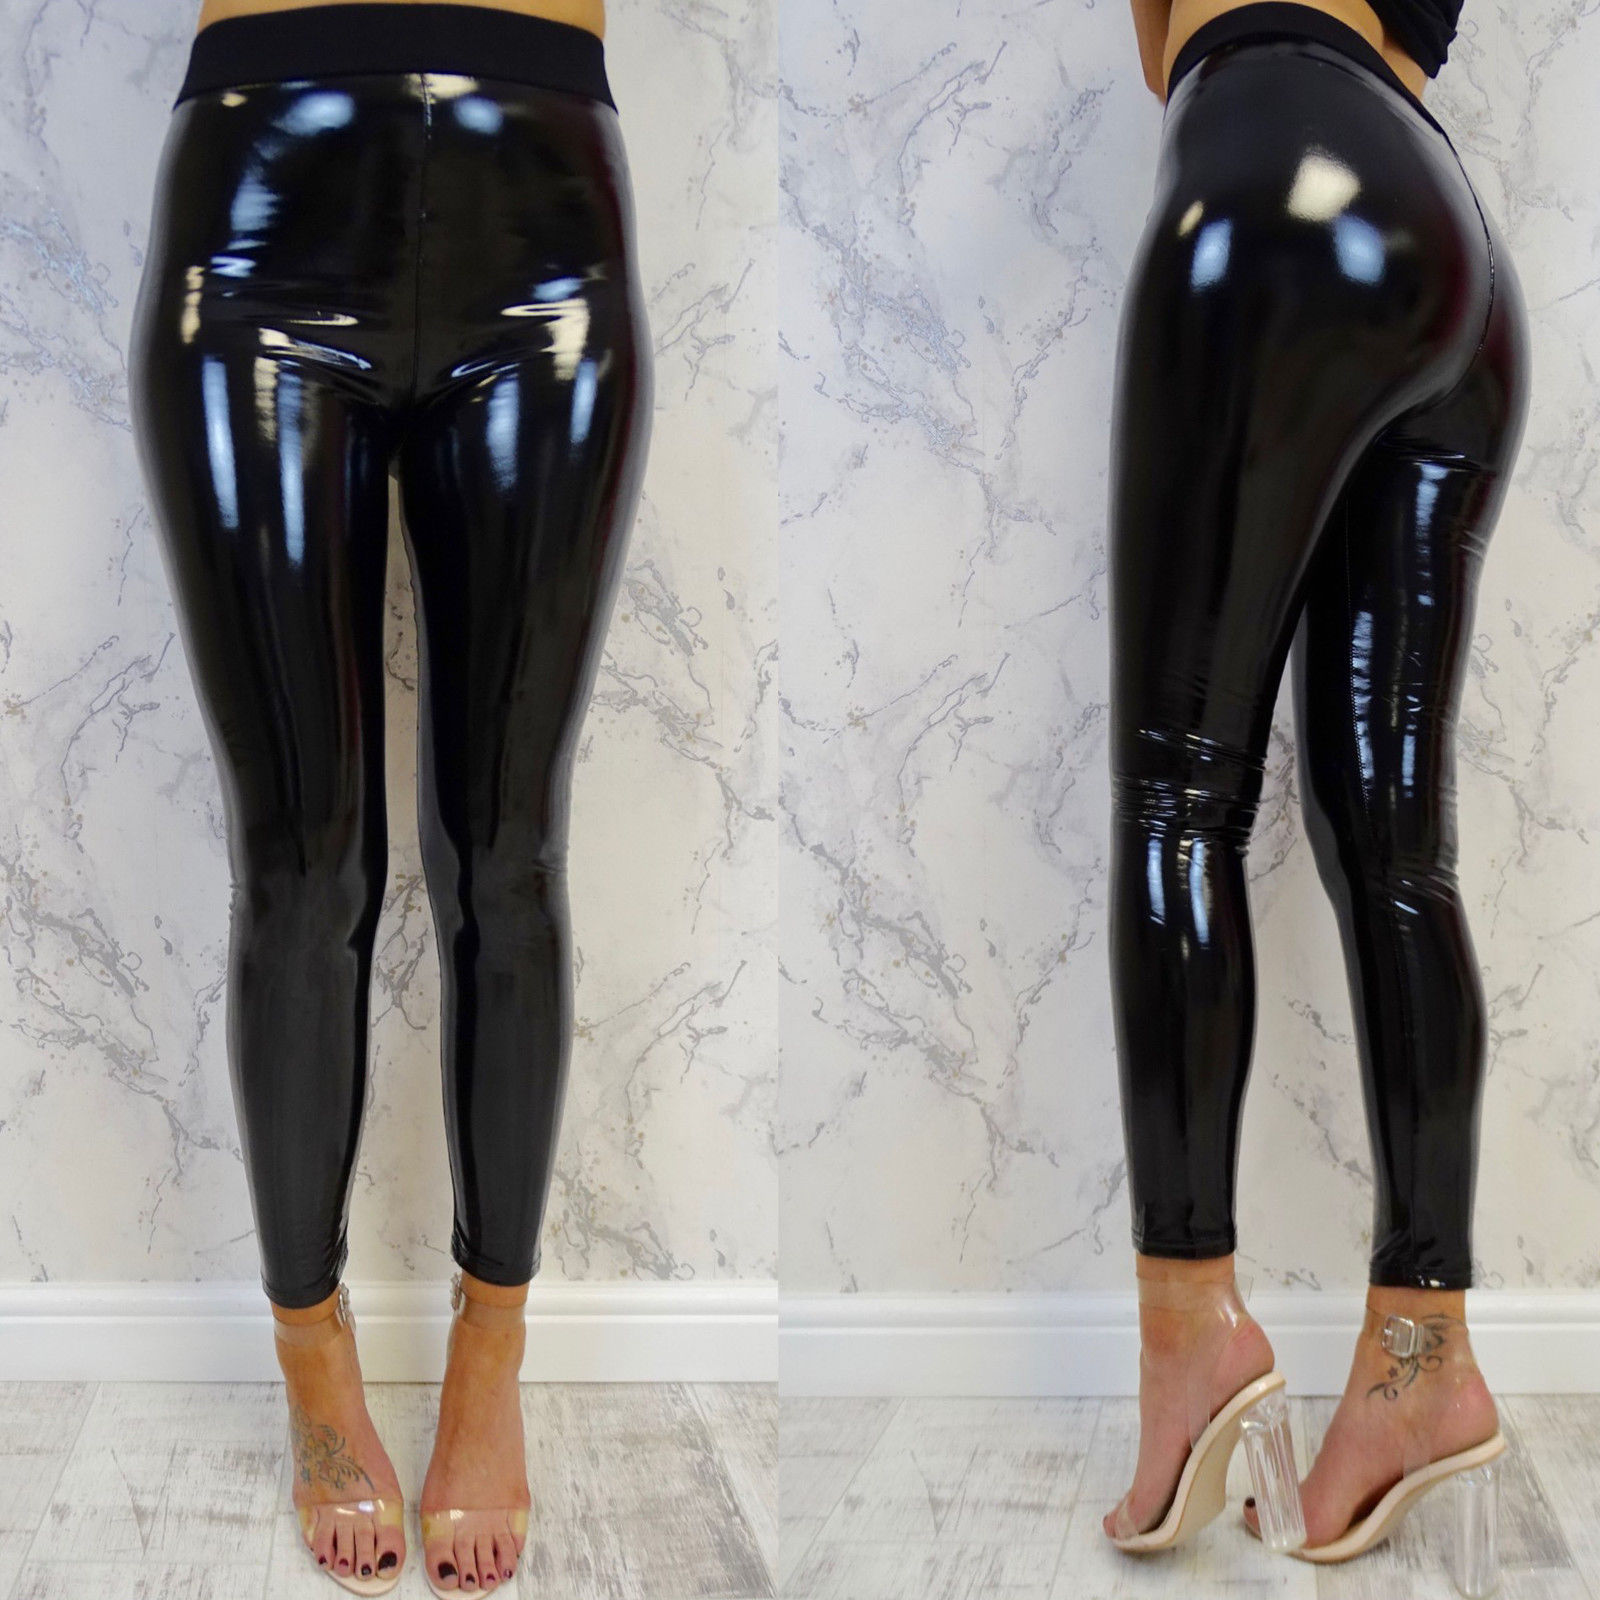 Womens Ladies Soft Strethcy Shiny Wet Look Vinyl Leggings Trouser Pants Bottoms Women Sexy Pencil Pants